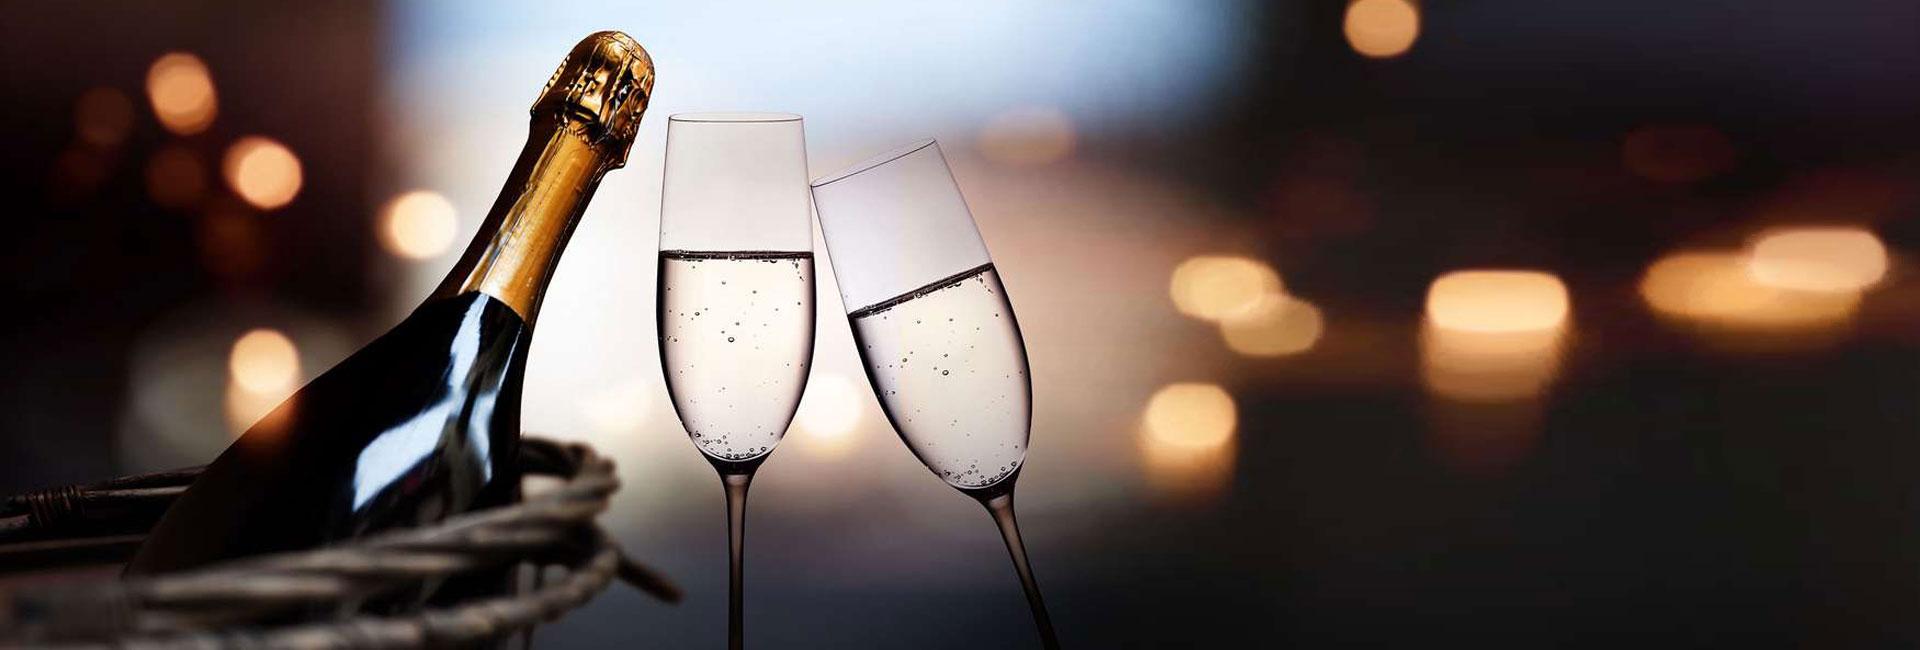 Celebratory Bottles